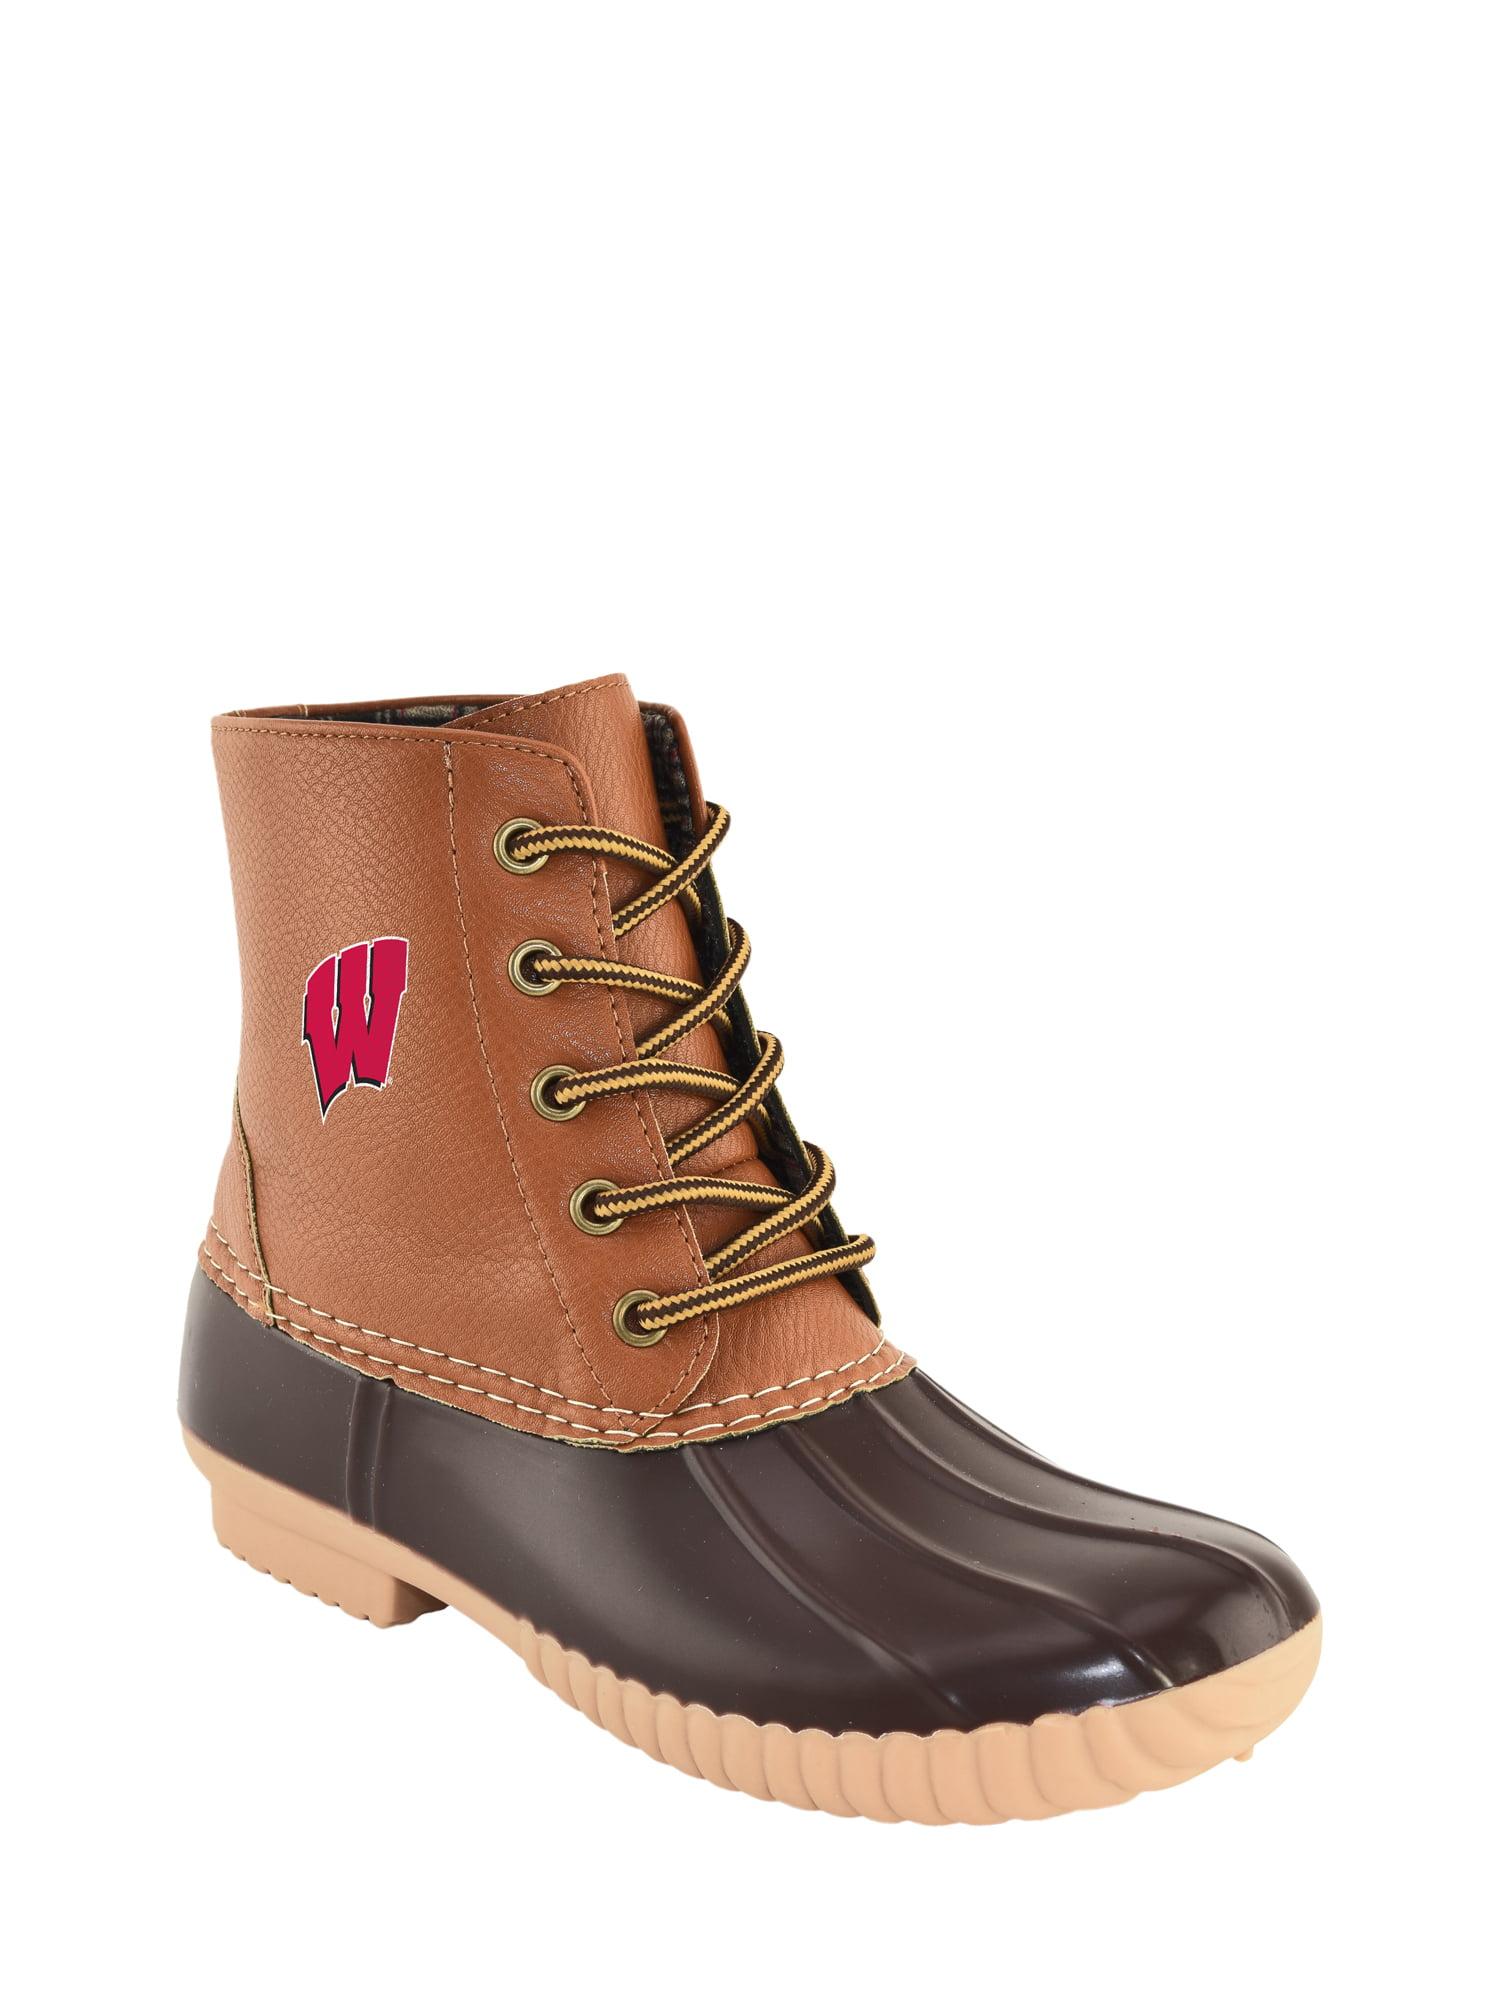 NCAA Women's Wisconsin -High Duck Boot by Jordache LTD